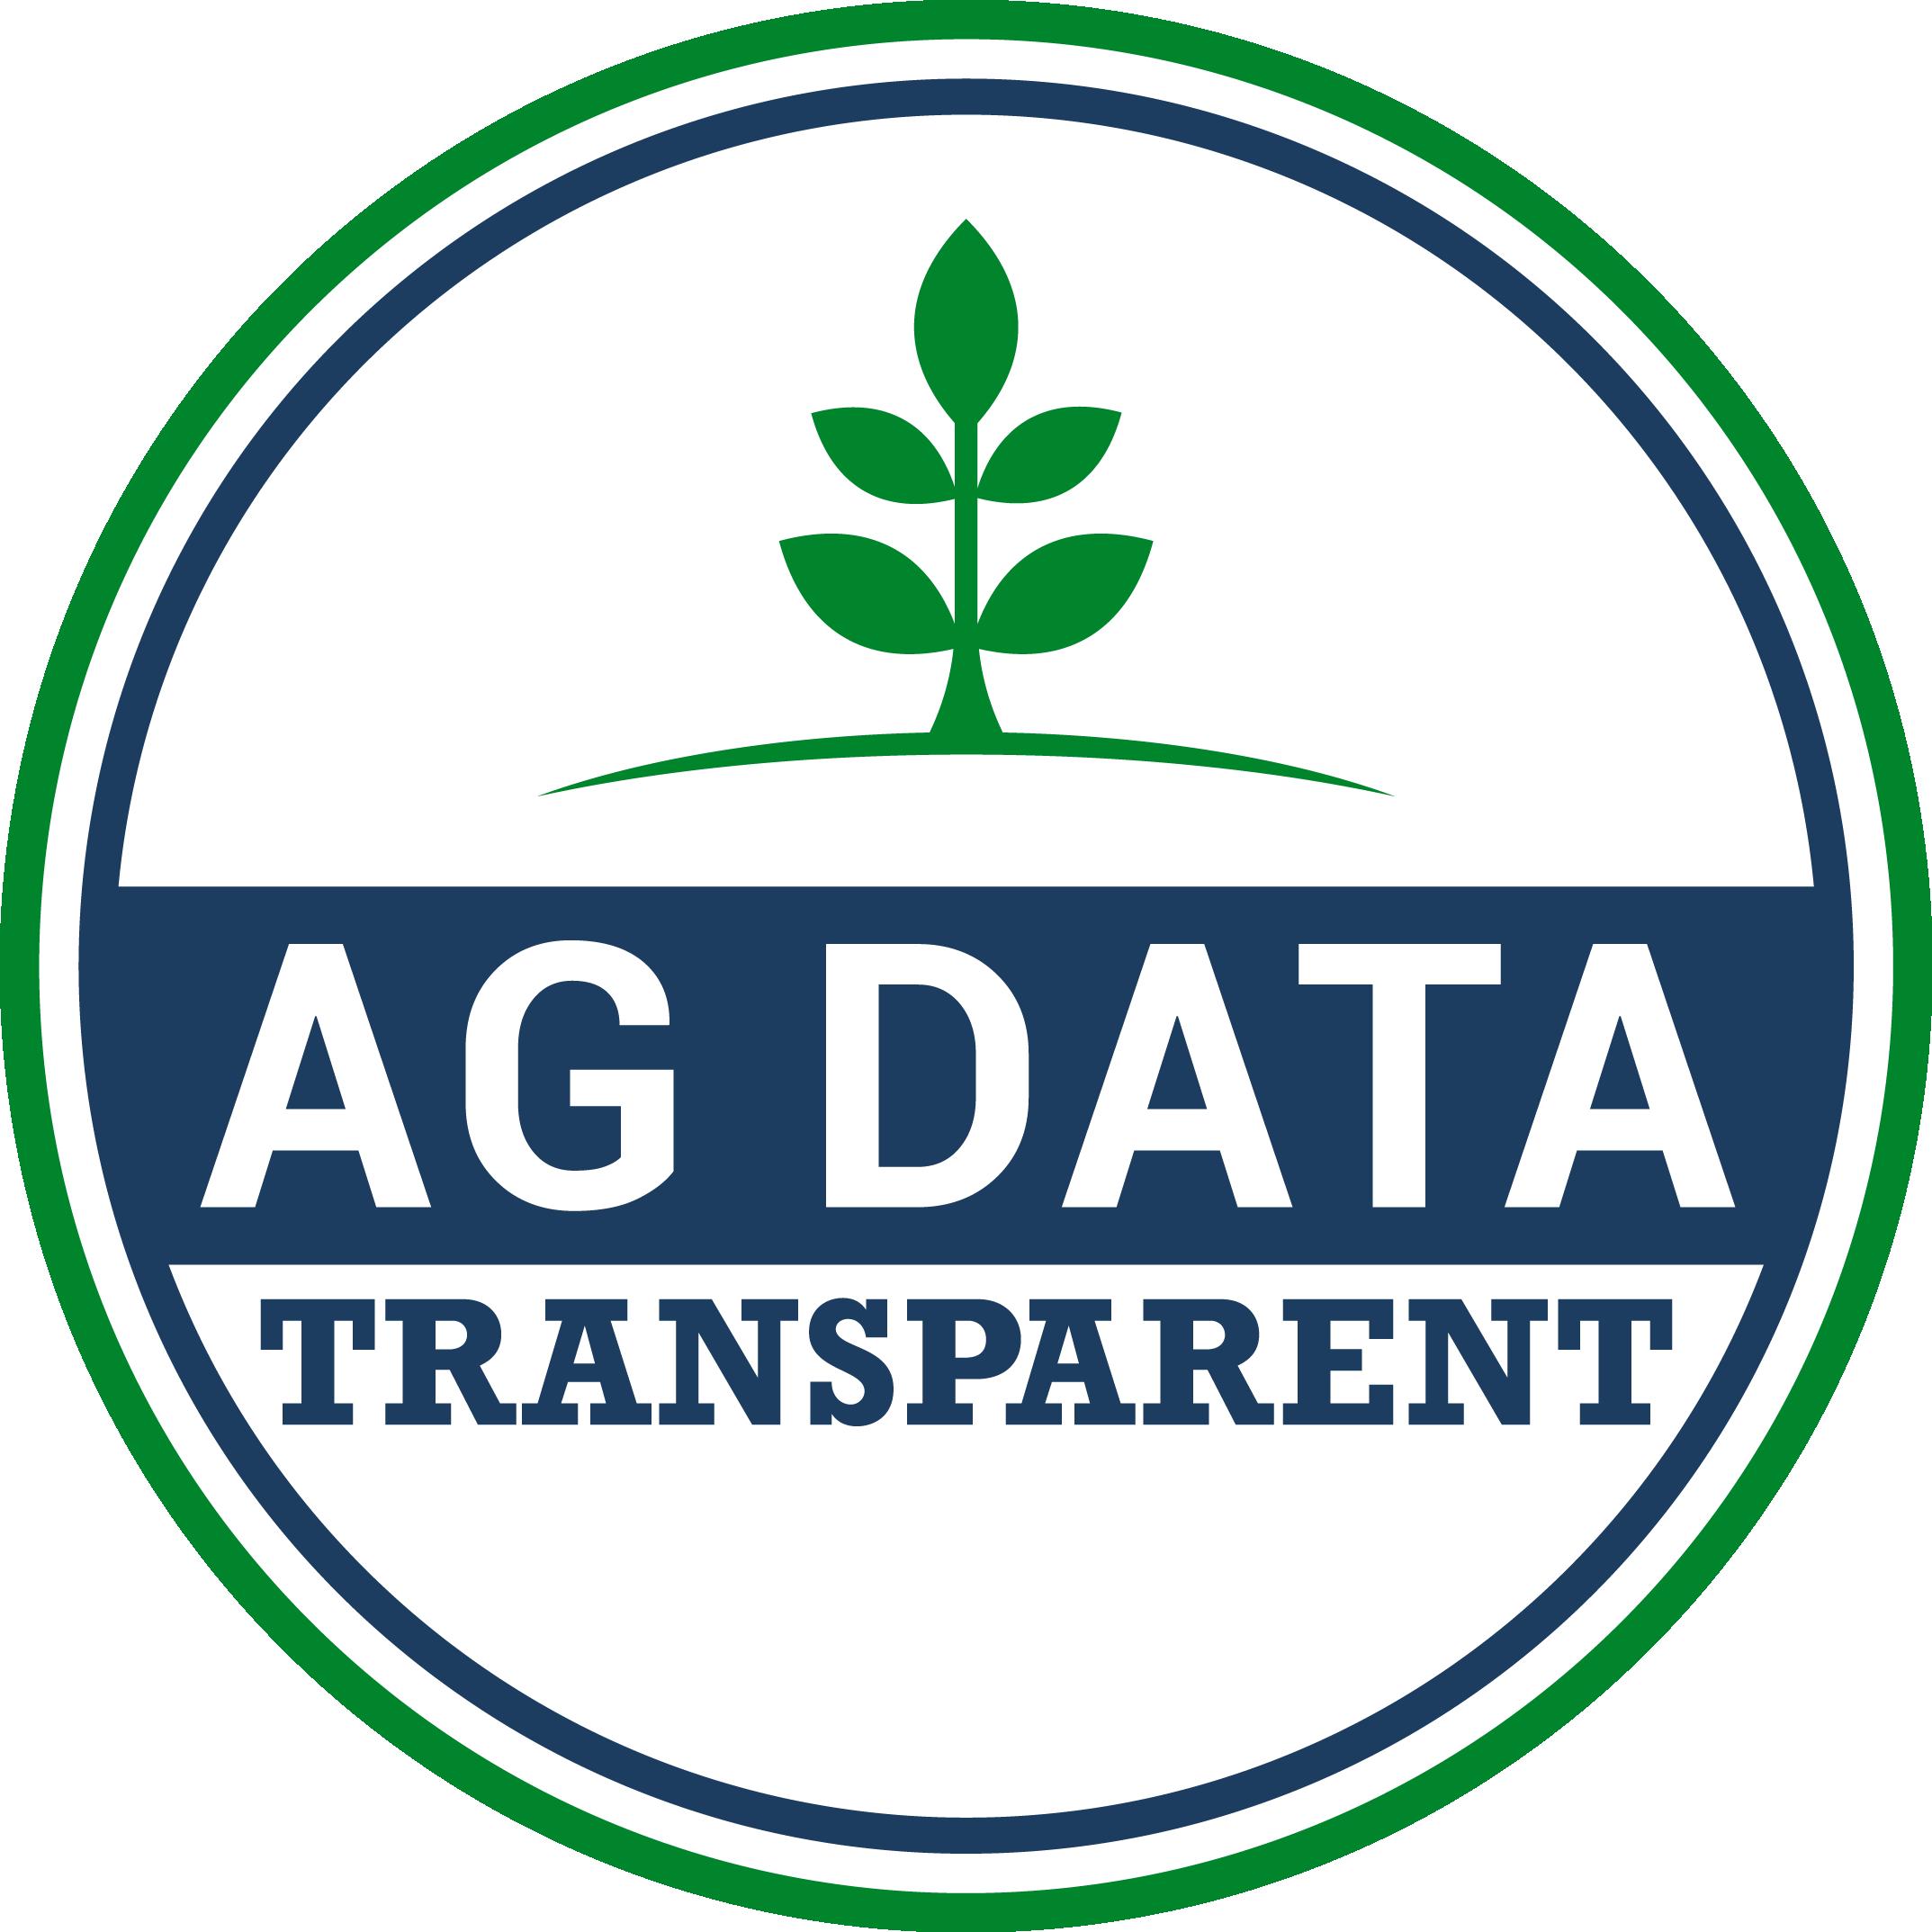 Ag Data Transparent Seal